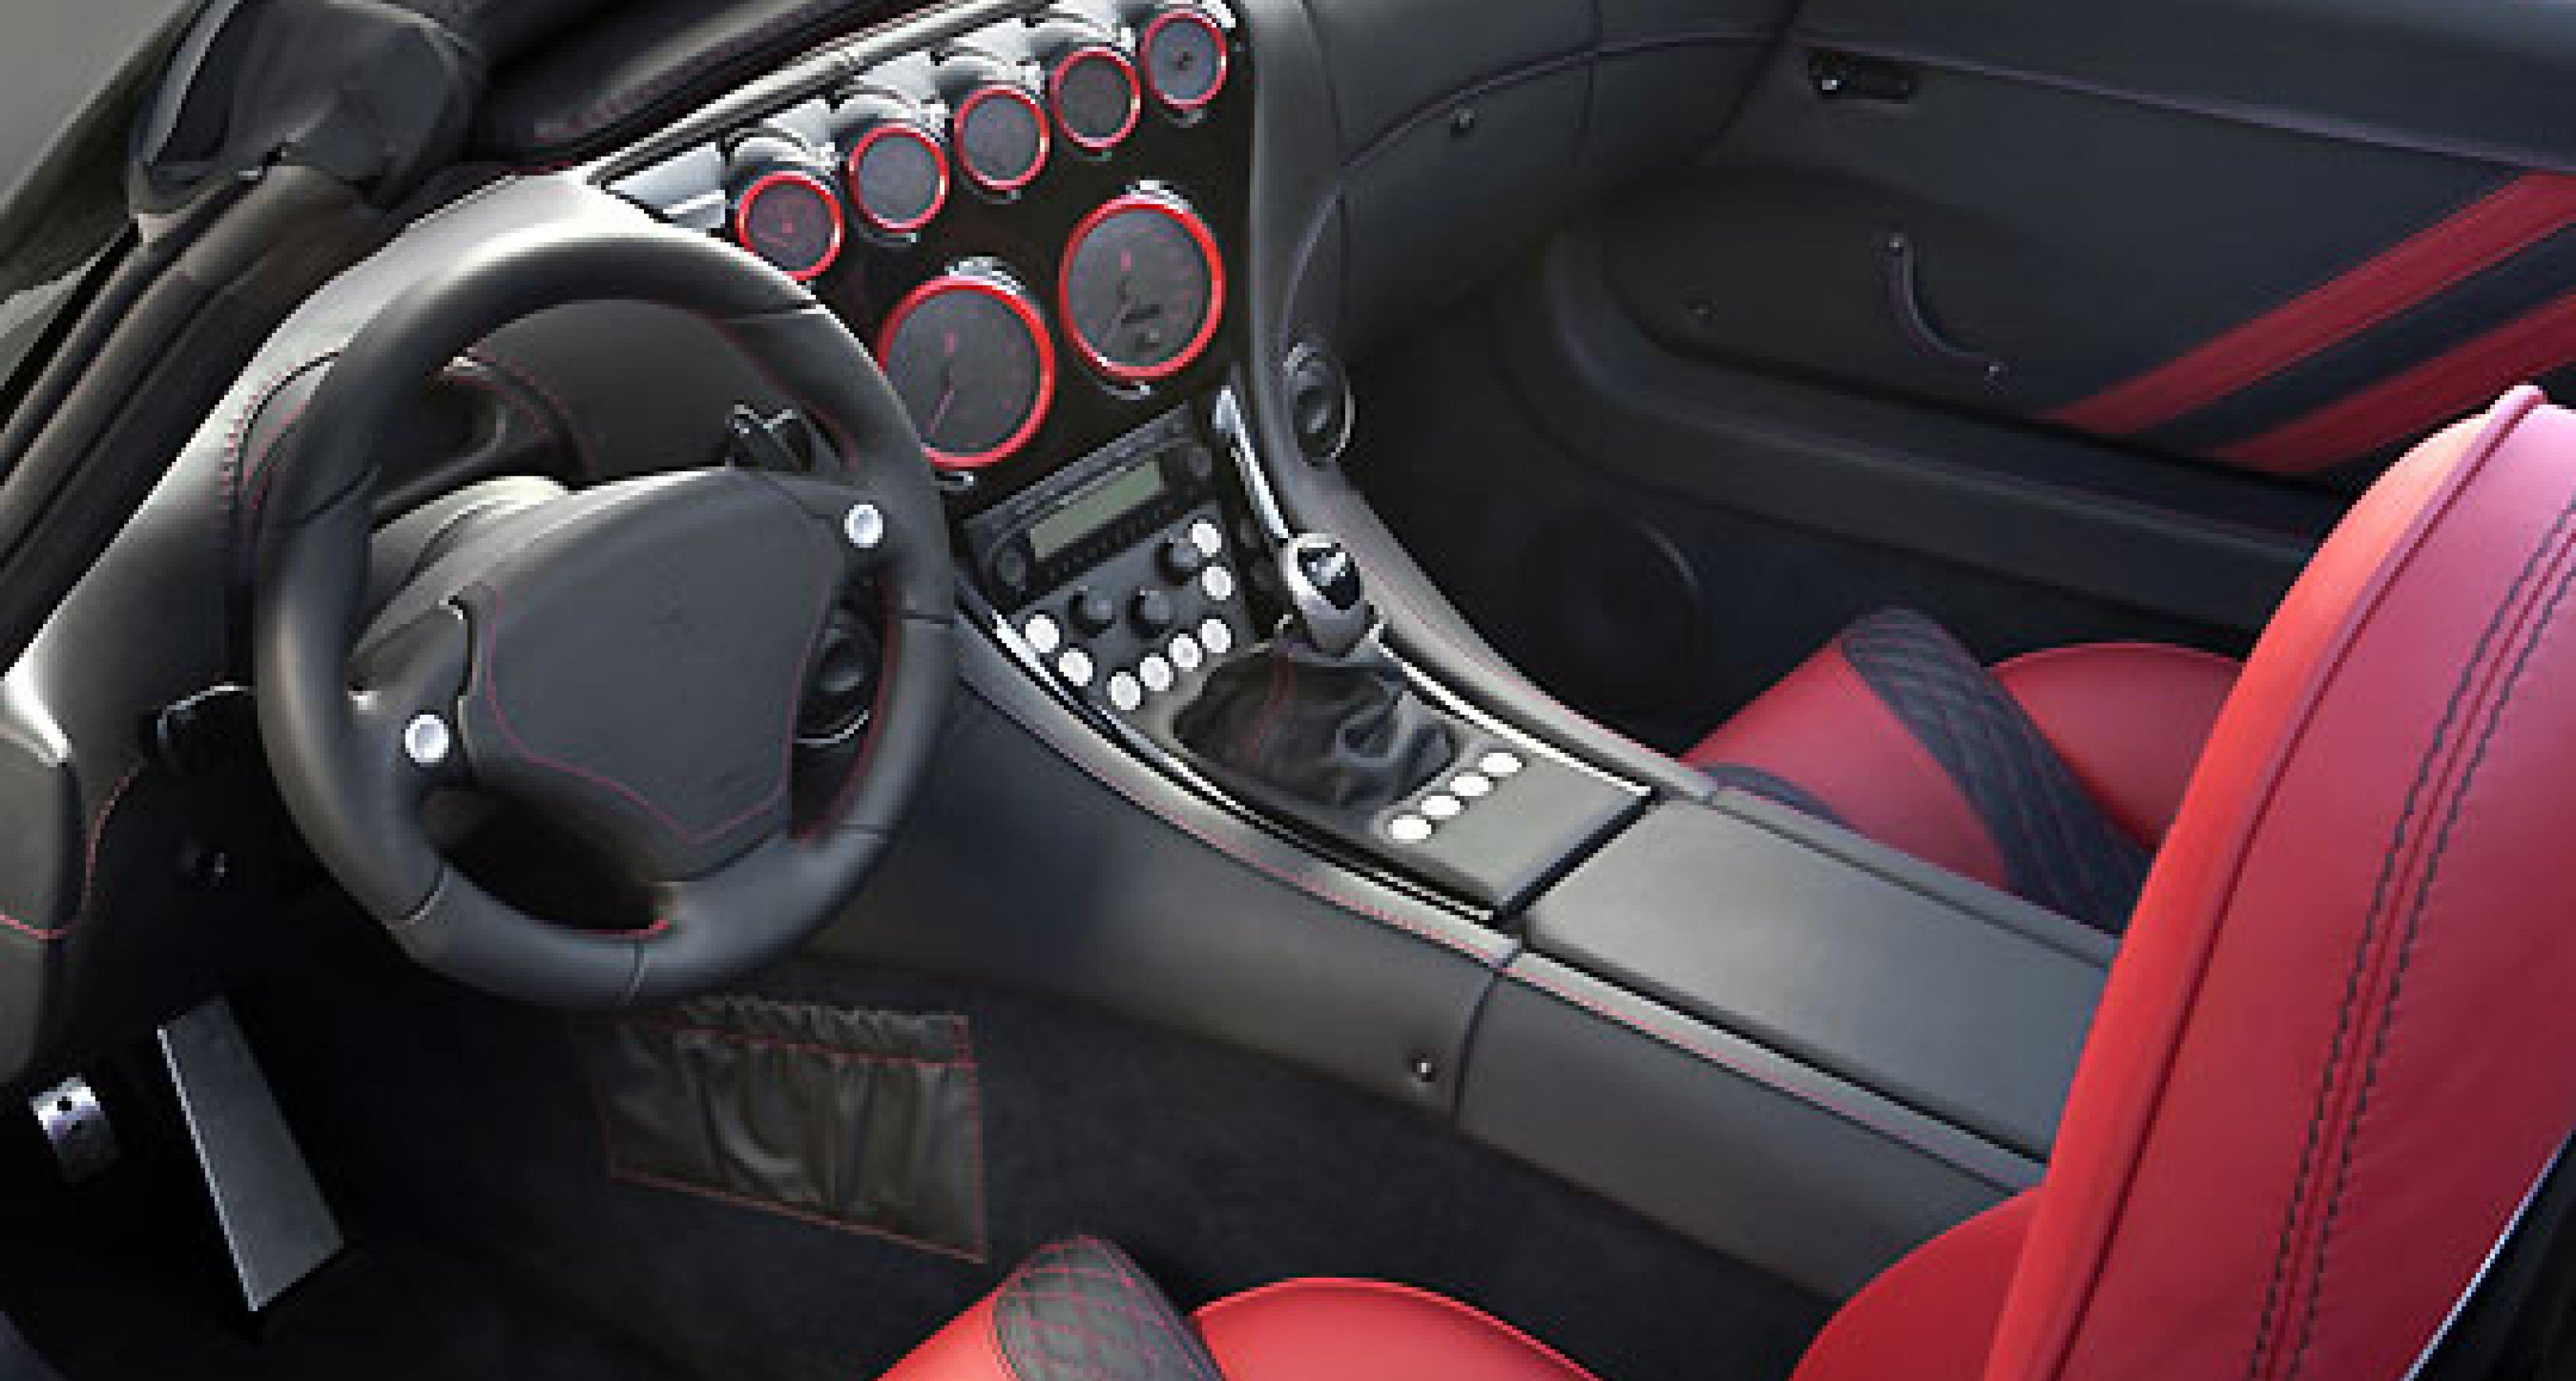 Wiesmann MF4 und MF4-S Roadster: Kraftbrüder